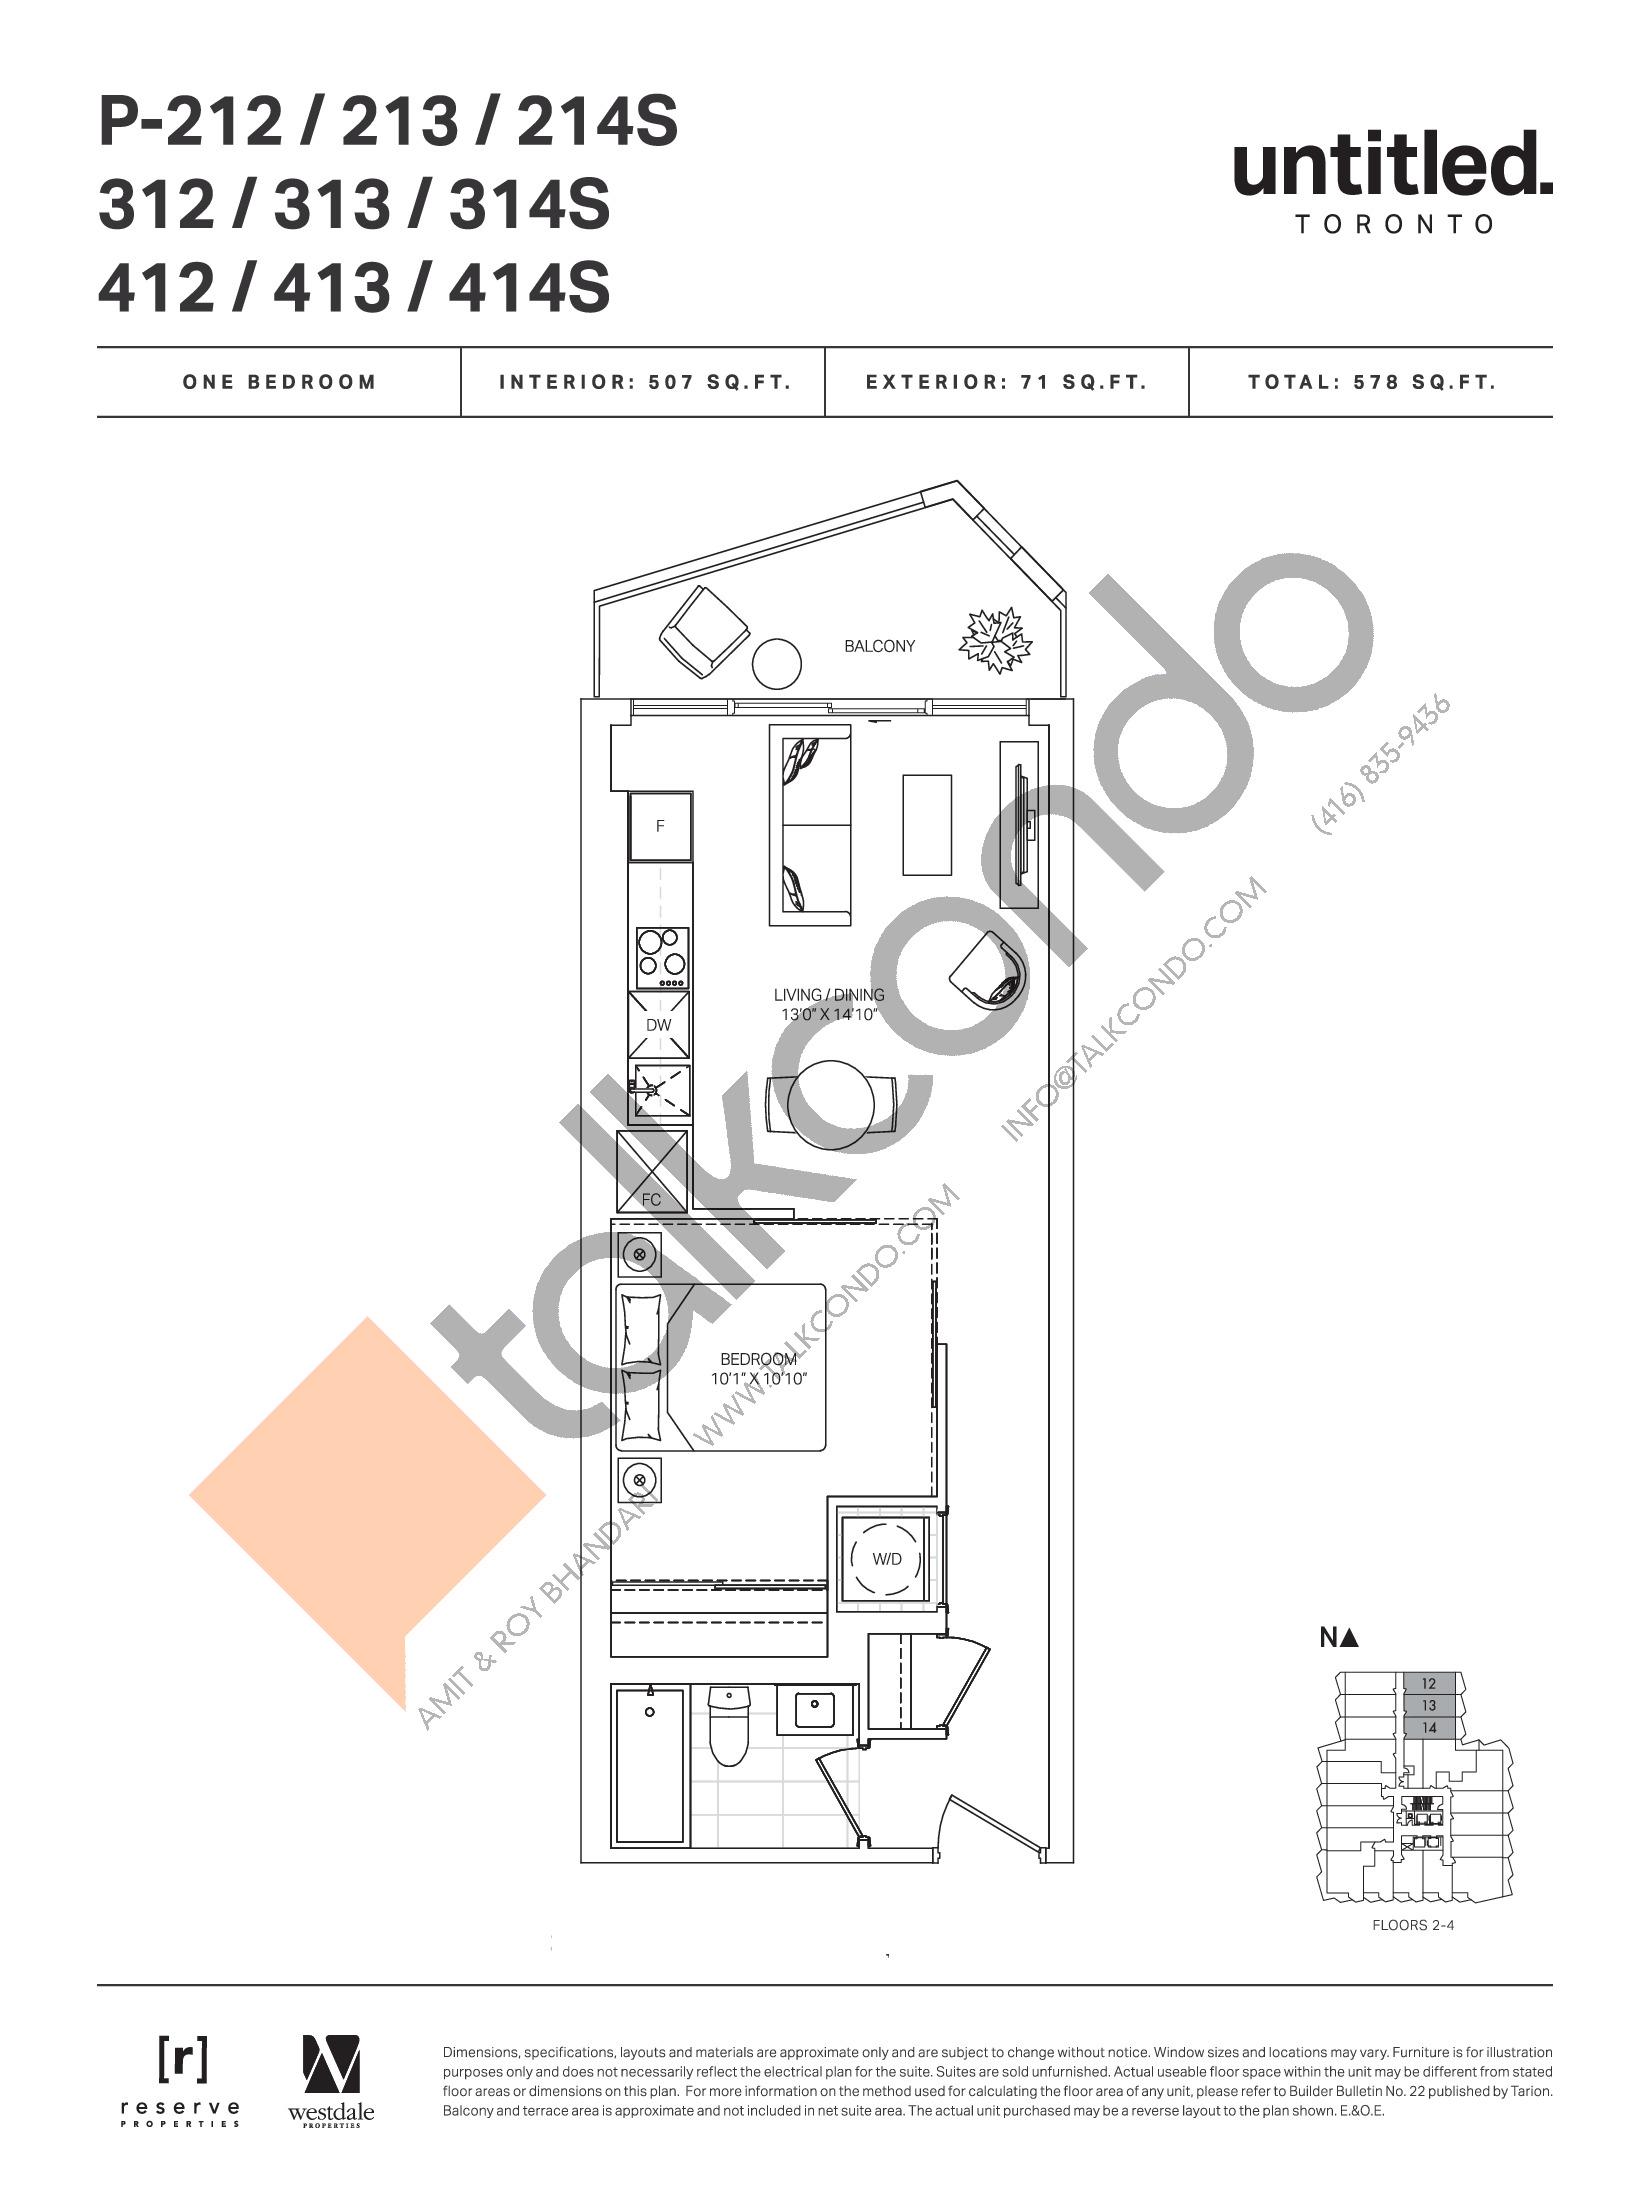 P-212 / 213 / 214S / 312 / 313 /314S / 412 / 413 / 414S Floor Plan at Untitled Toronto Condos - 507 sq.ft